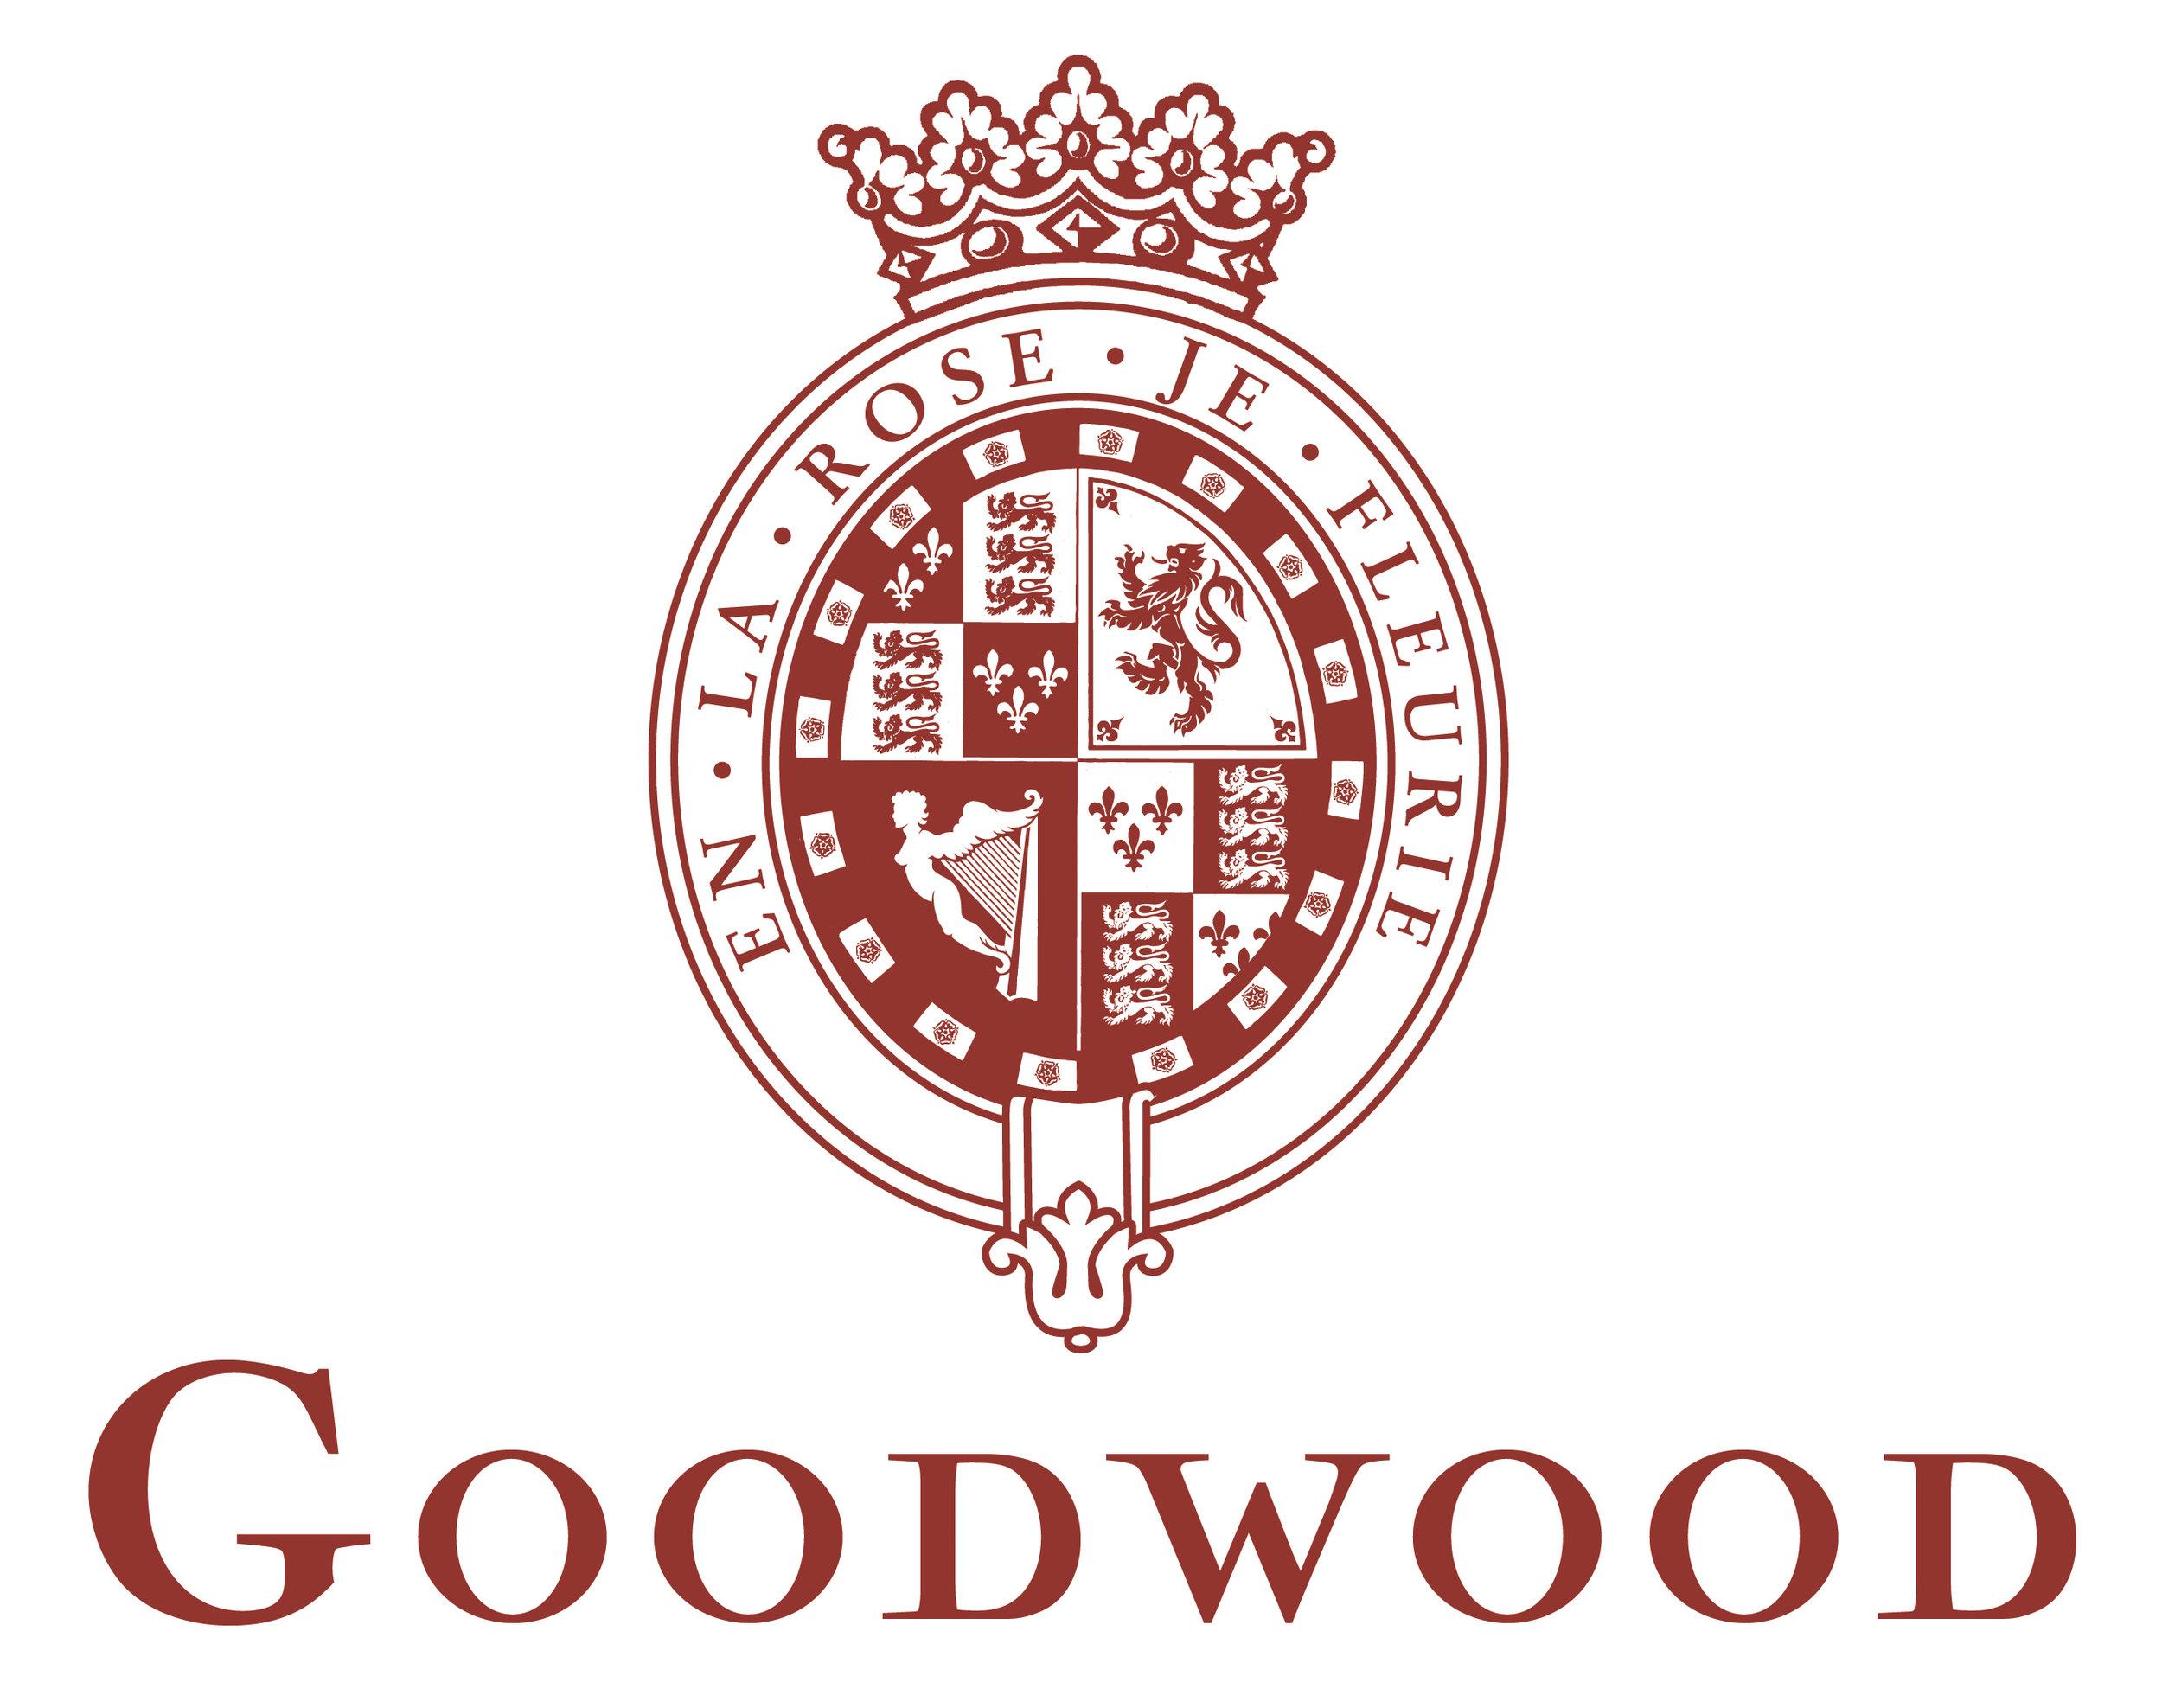 goodwood-logo-2.jpg